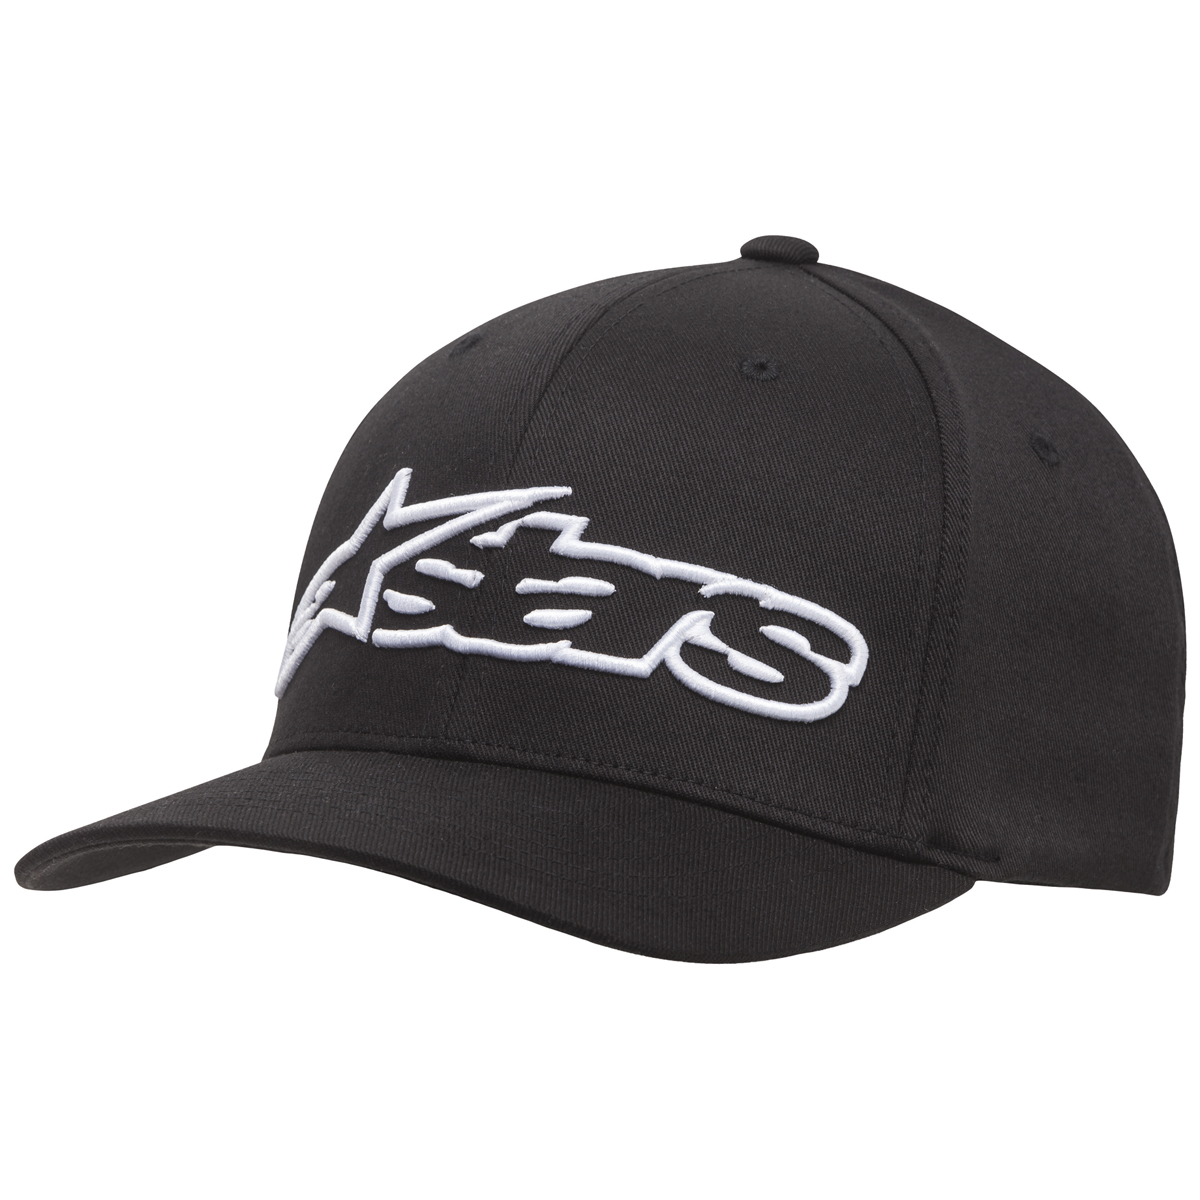 Alpinestars Blaze Black/White Flexfit Hat